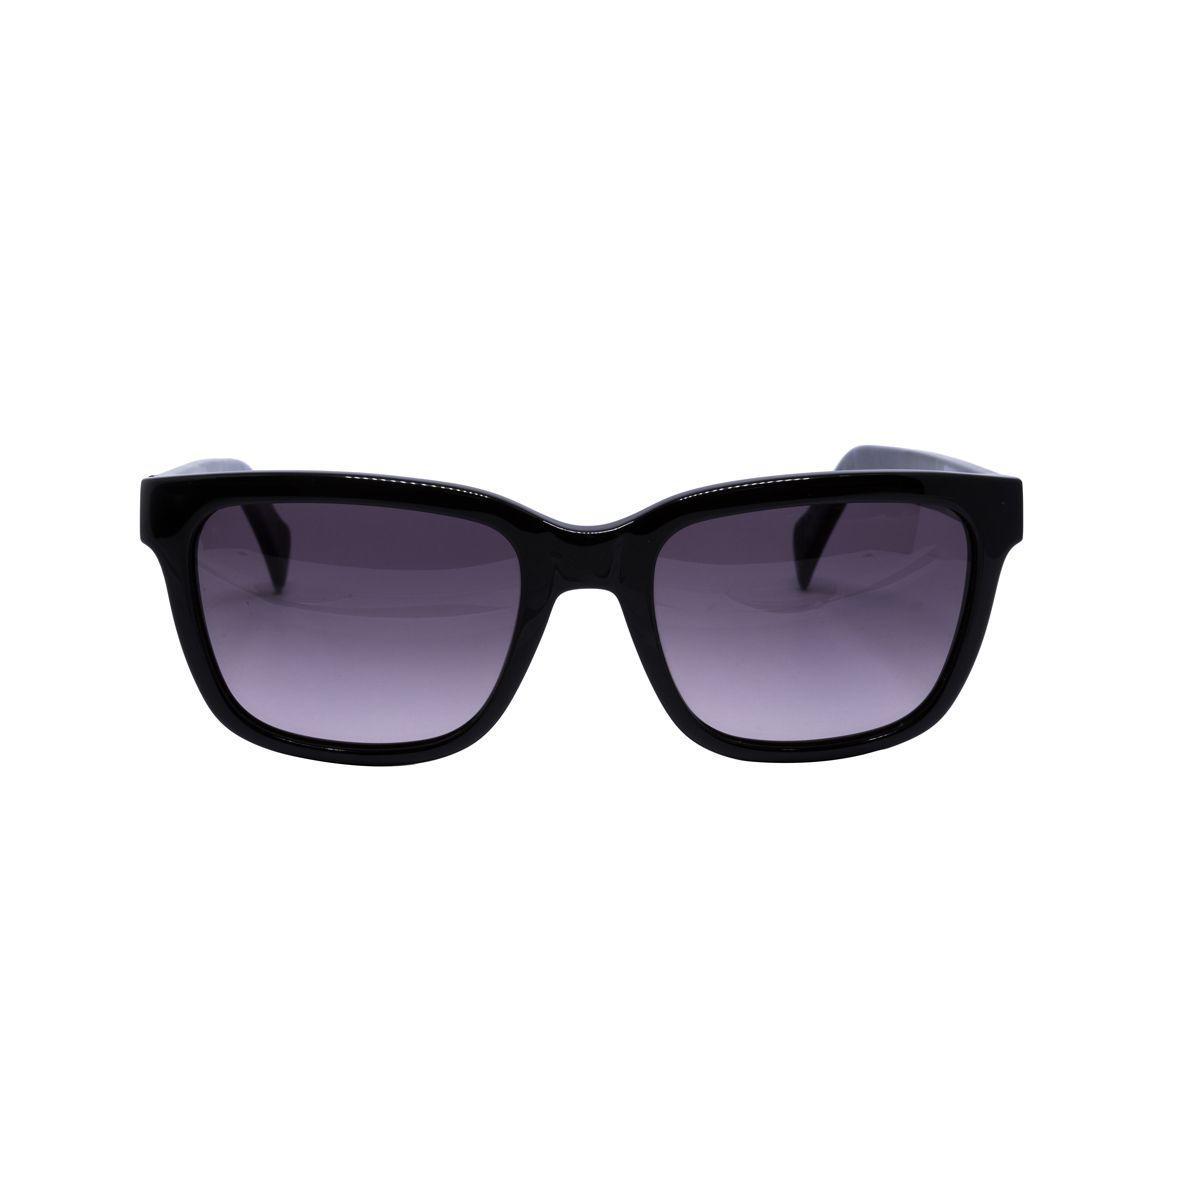 57c5ff5b99ff9 Óculos de Sol Tommy Hilfiger Feminino TH1289 S - Acetato Preto e Lente  Bordô Degradê R  375